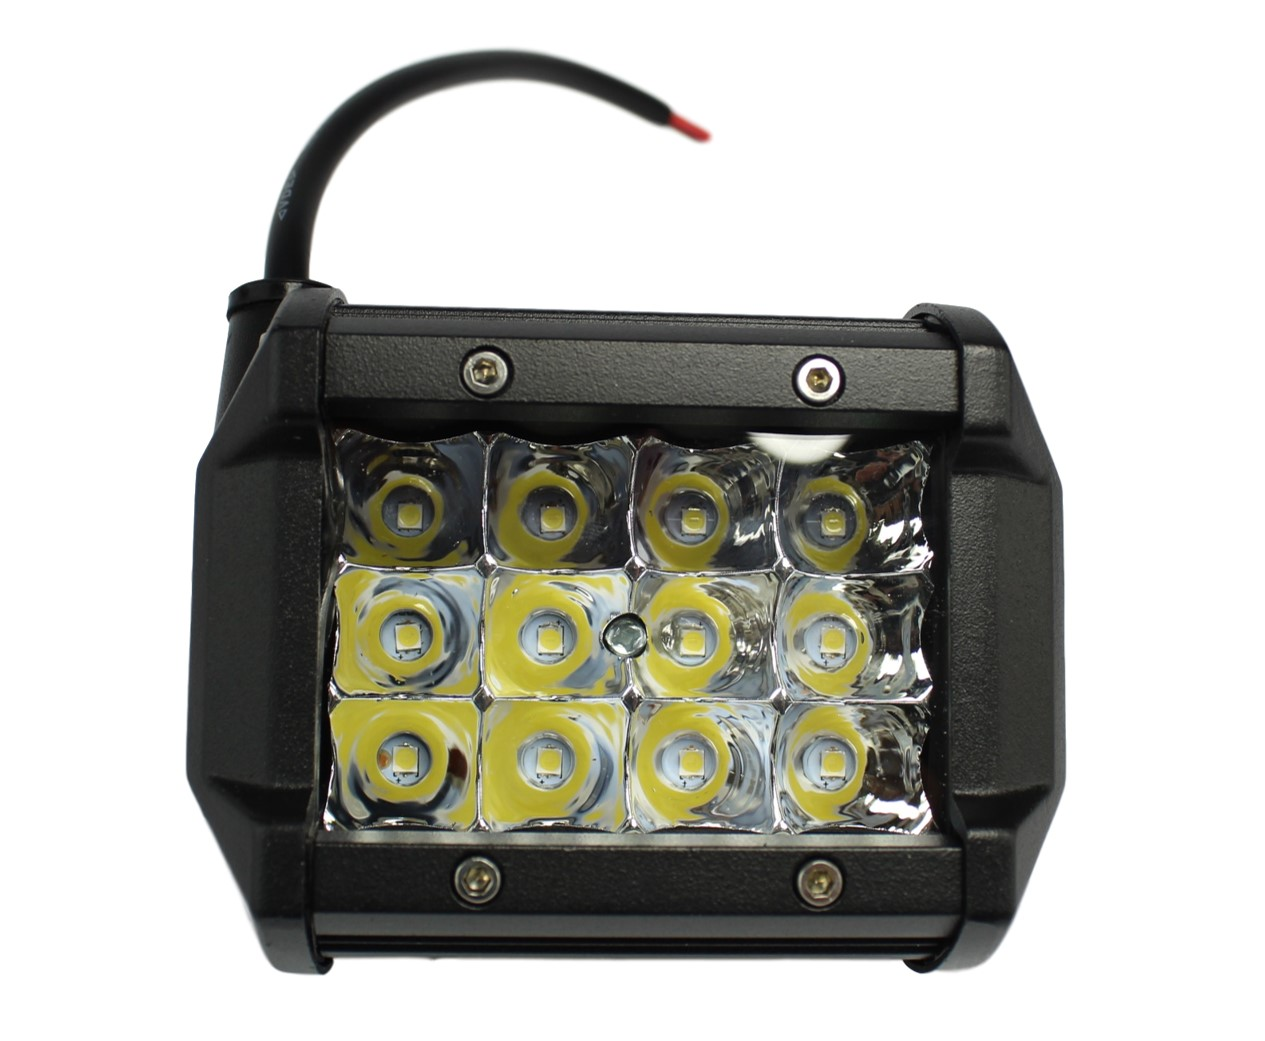 FAROL DE MILHA LED RETANGULAR 12 LEDS BIVOLT 36W UNIVERSAL